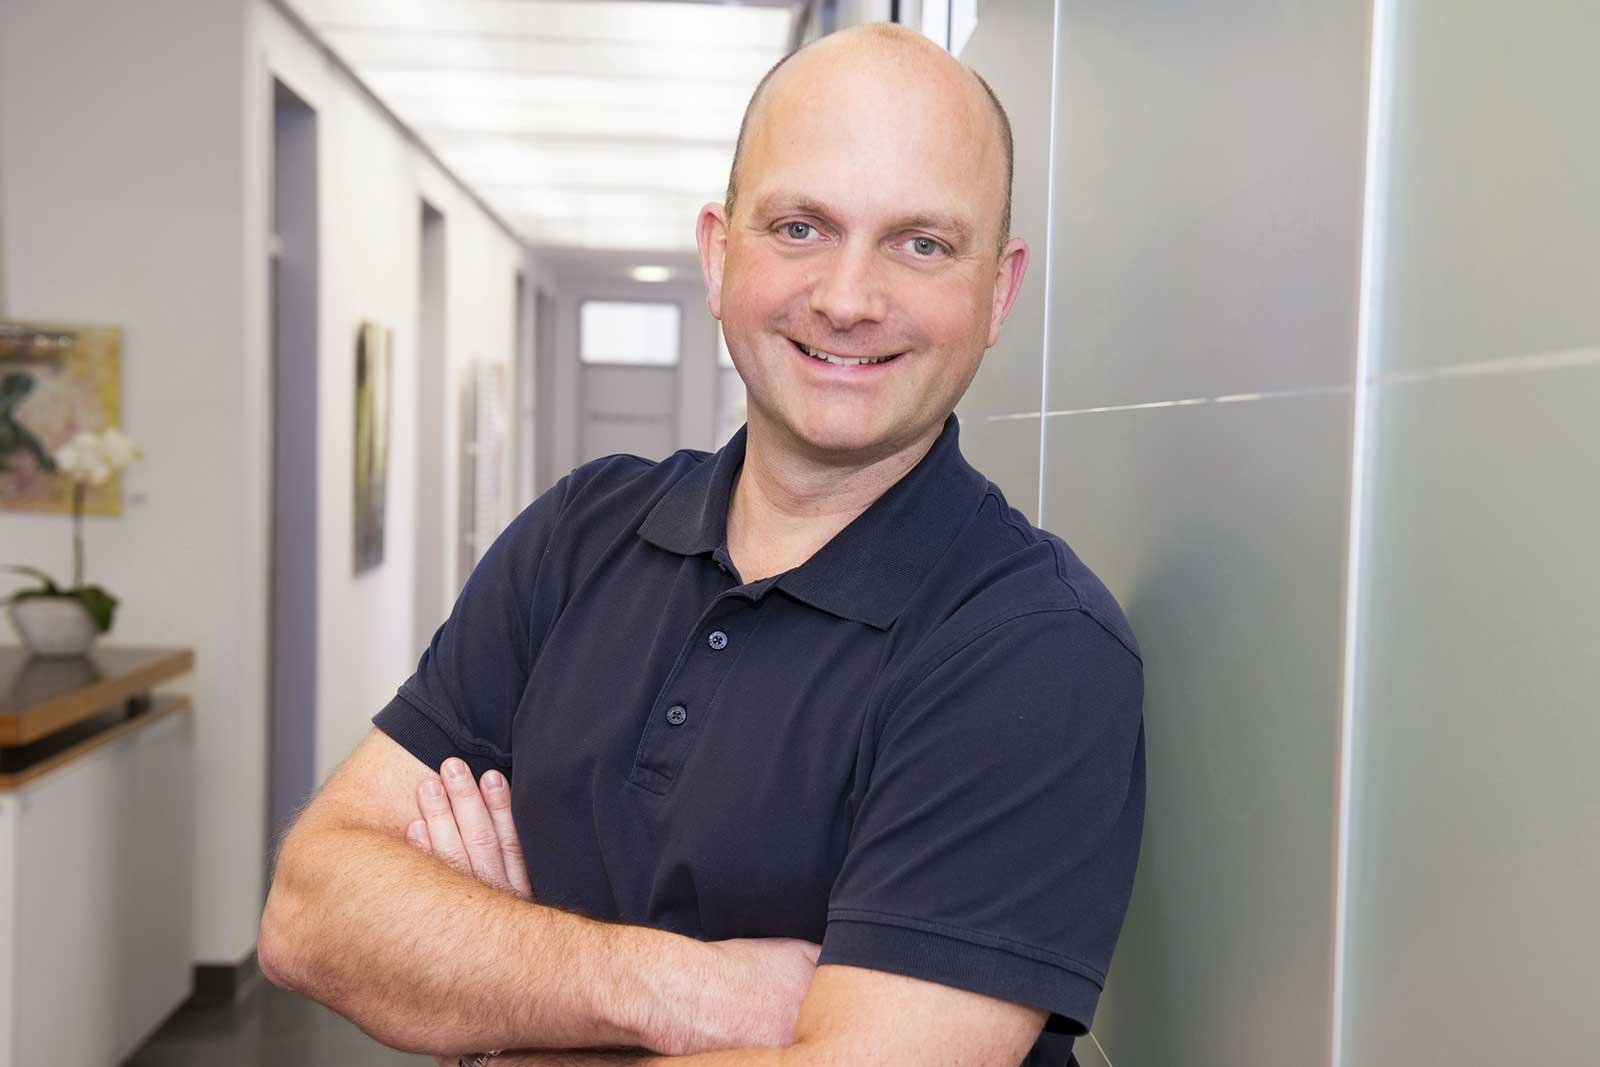 Hautarztpraxis Dr Med Claudia Und Dr Med Detlef Dieckmann